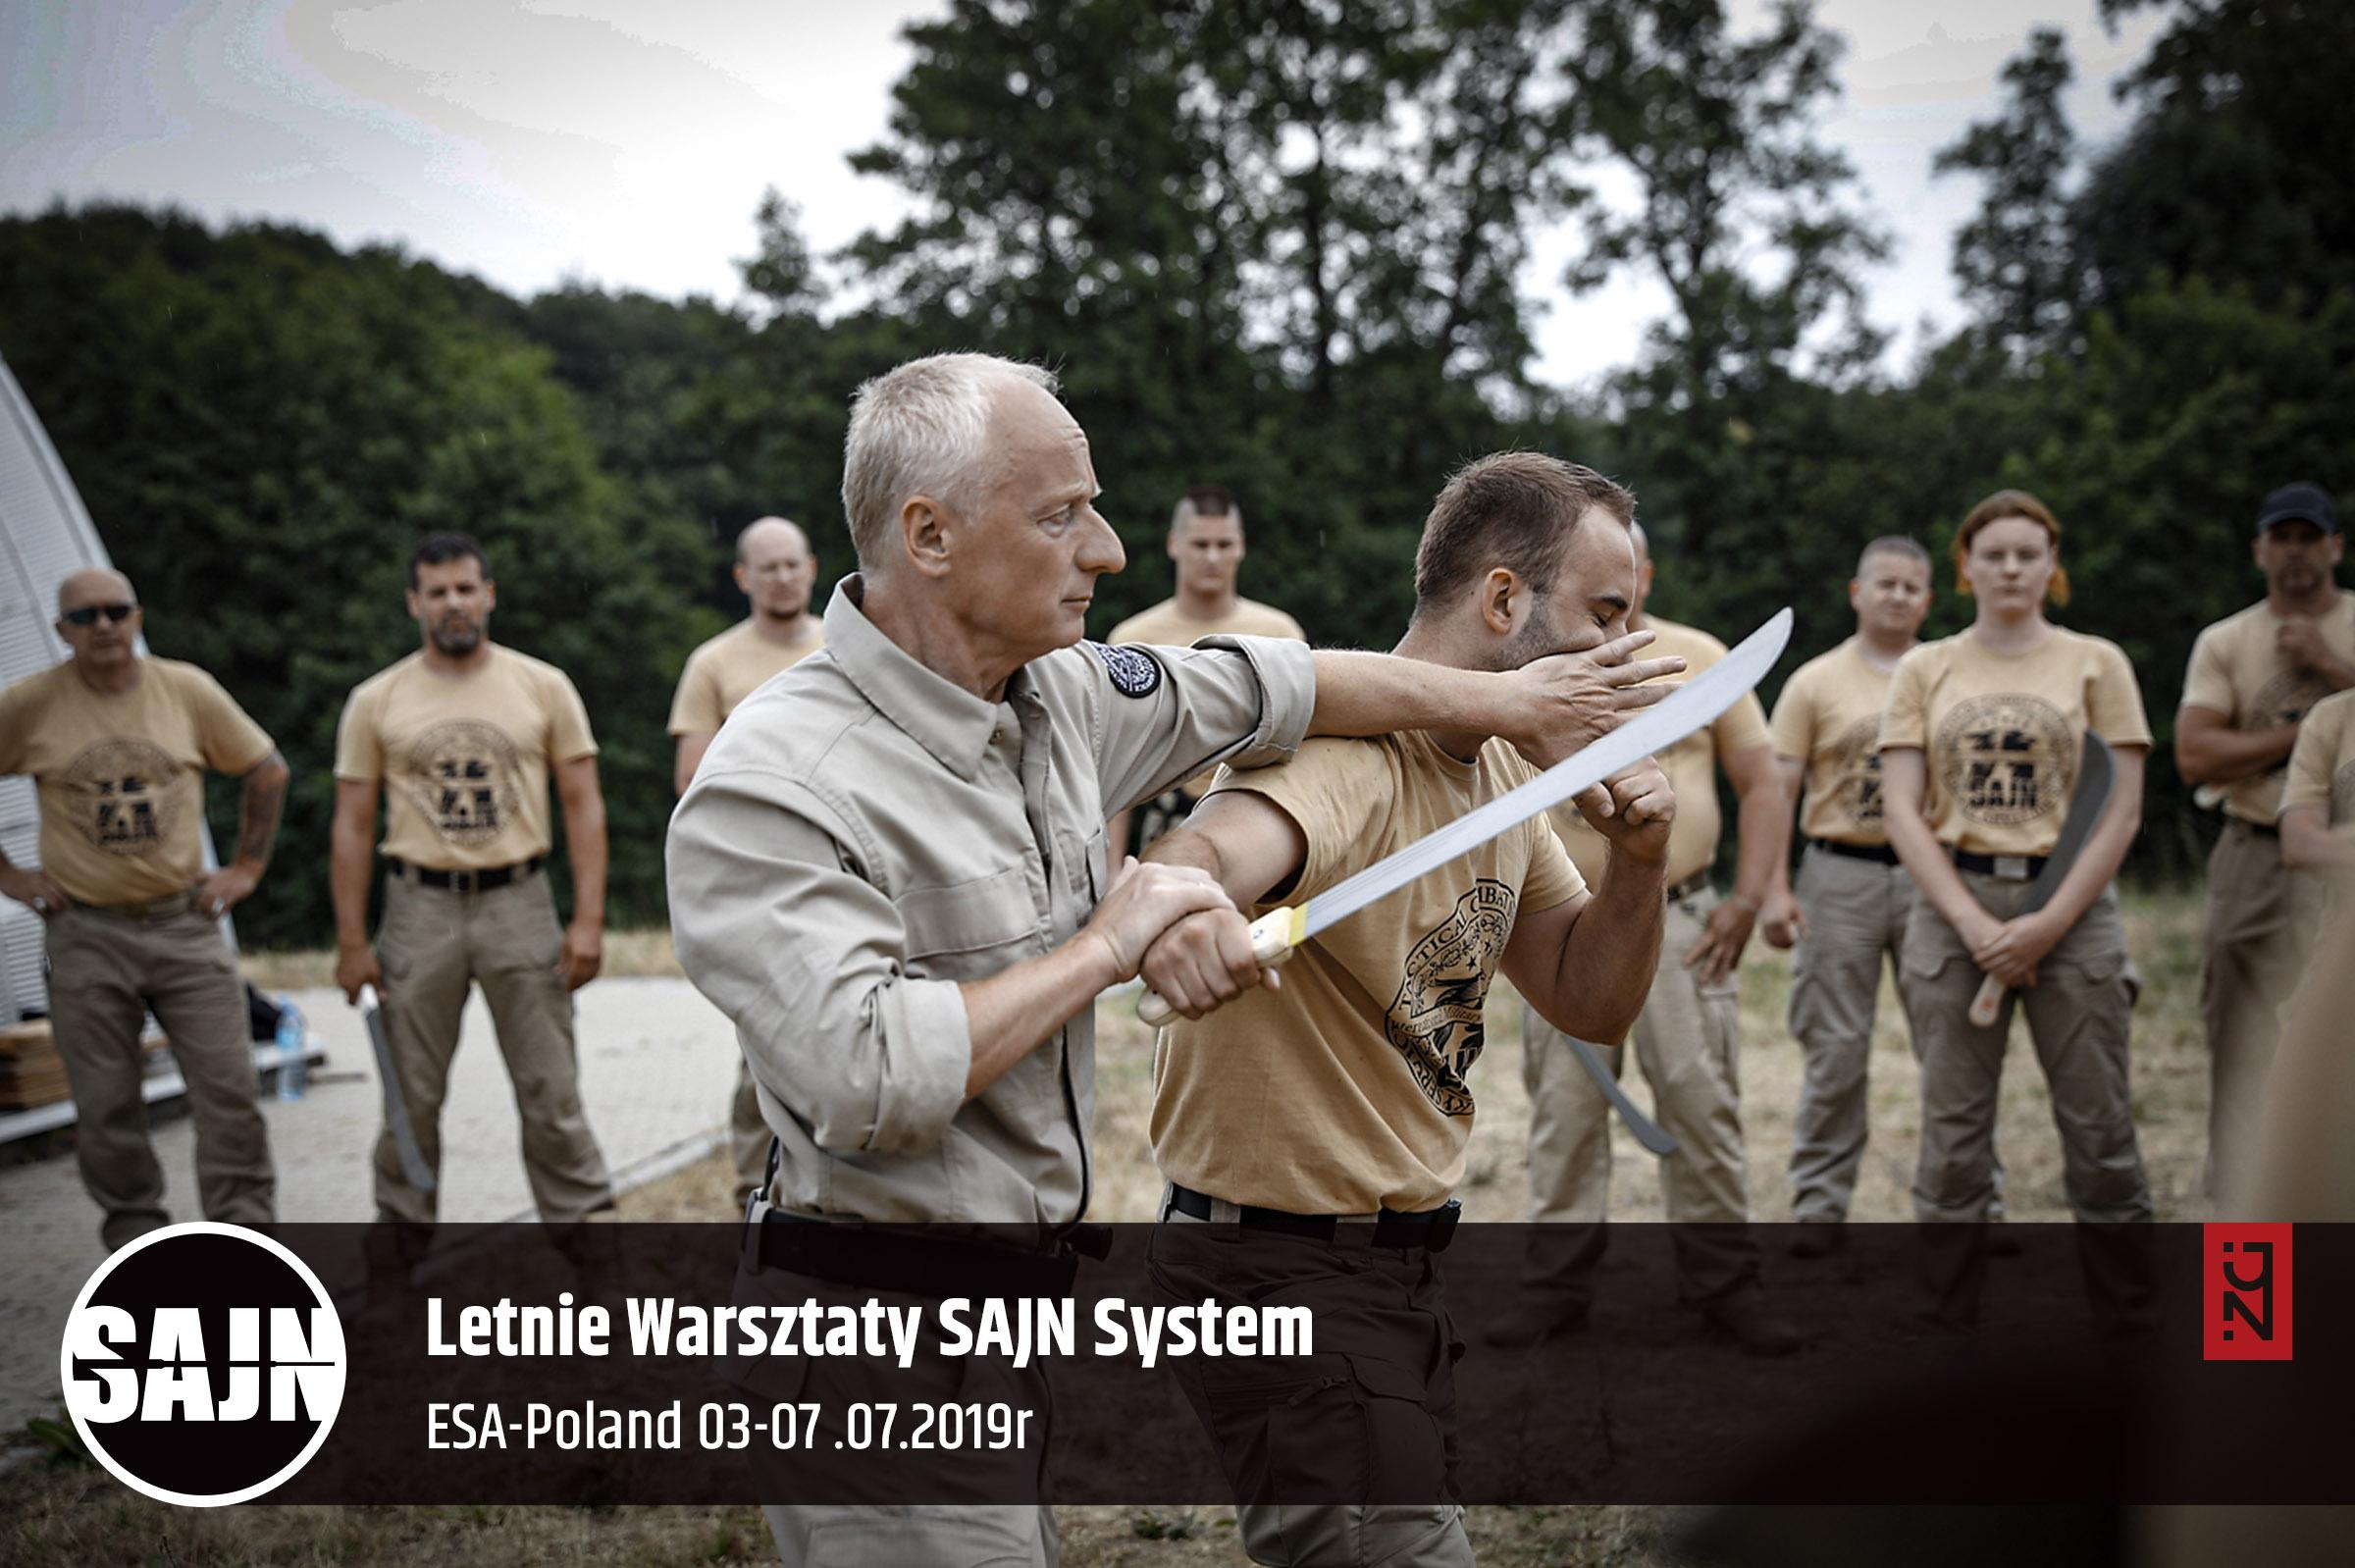 jan nycek_sajn_szkolenie sluzb mundurowych_palka teleskopowa_noz_samoobrona_dosan_29.jpg